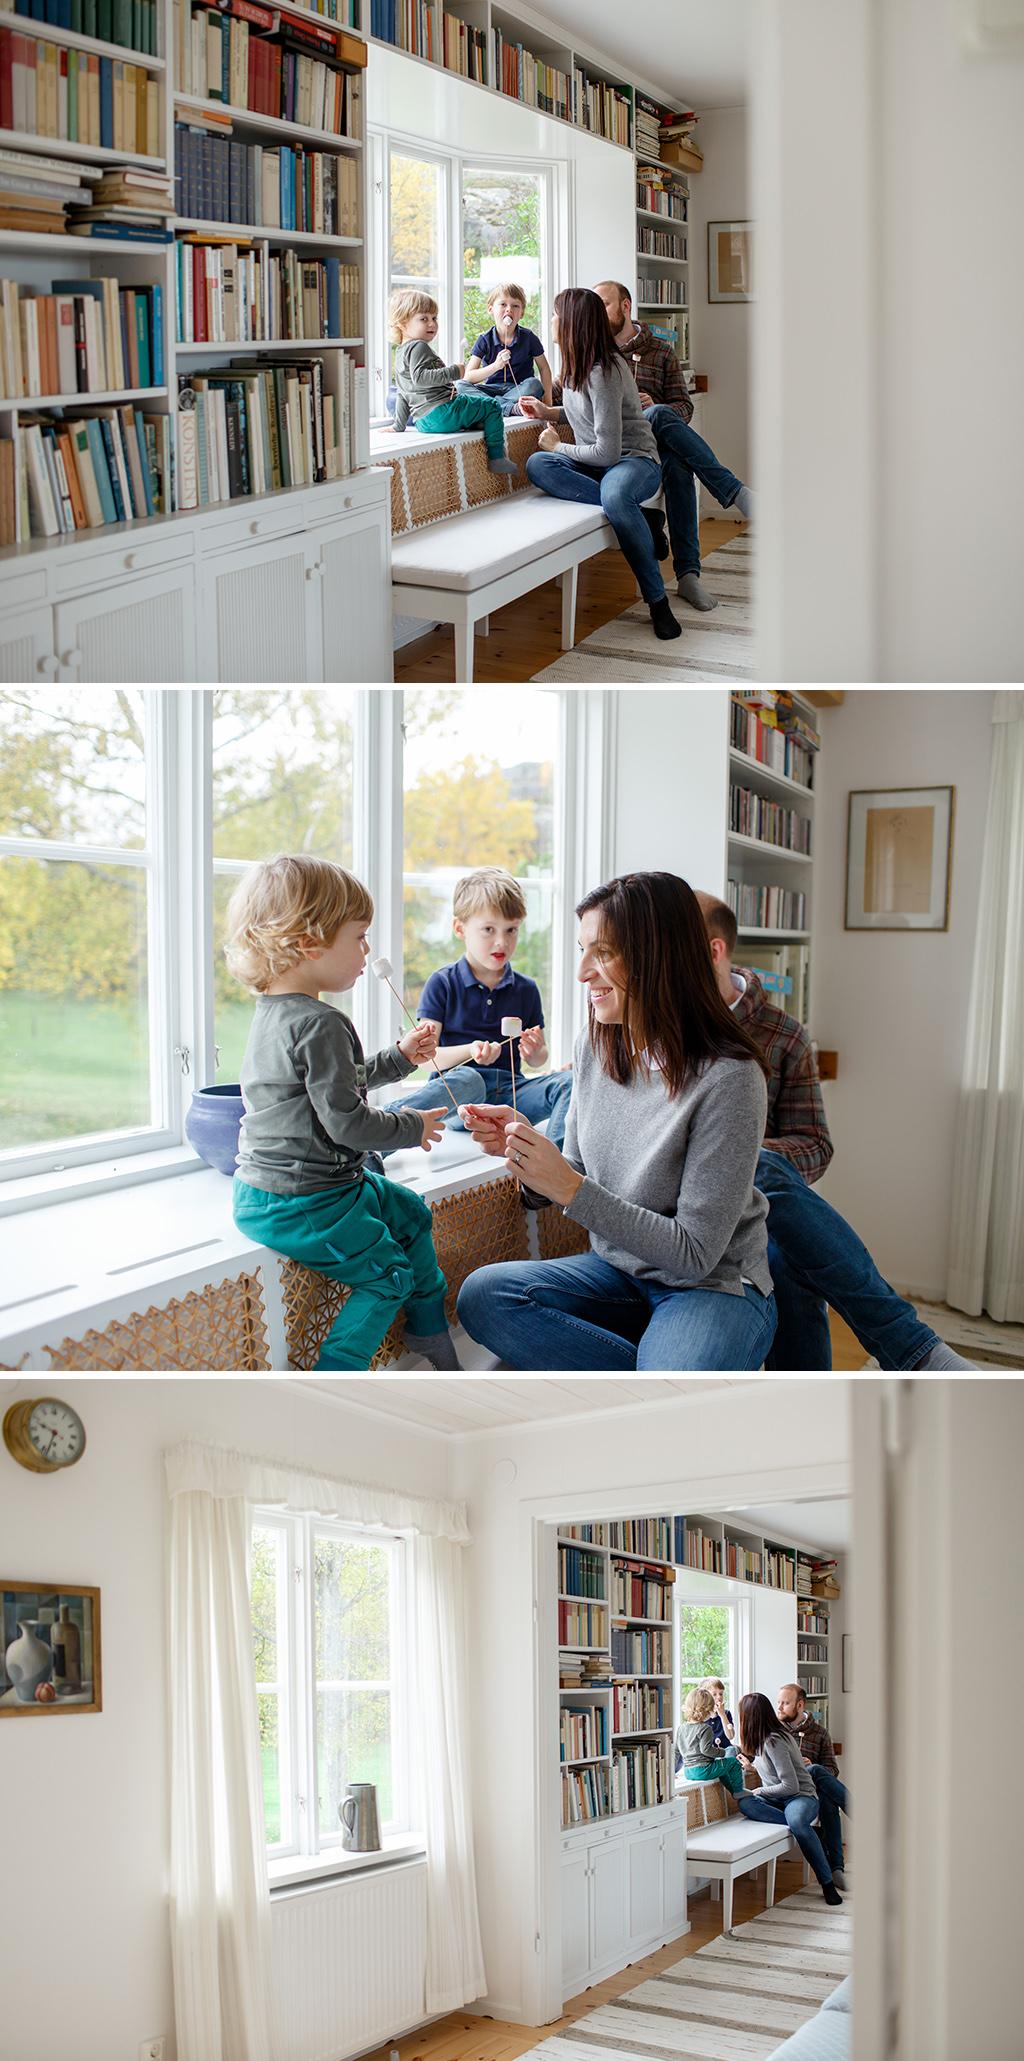 Hostfotografering_Lifestyle_hemma-hos-fotografering_Familjefotograf_Stockholm_20.jpg